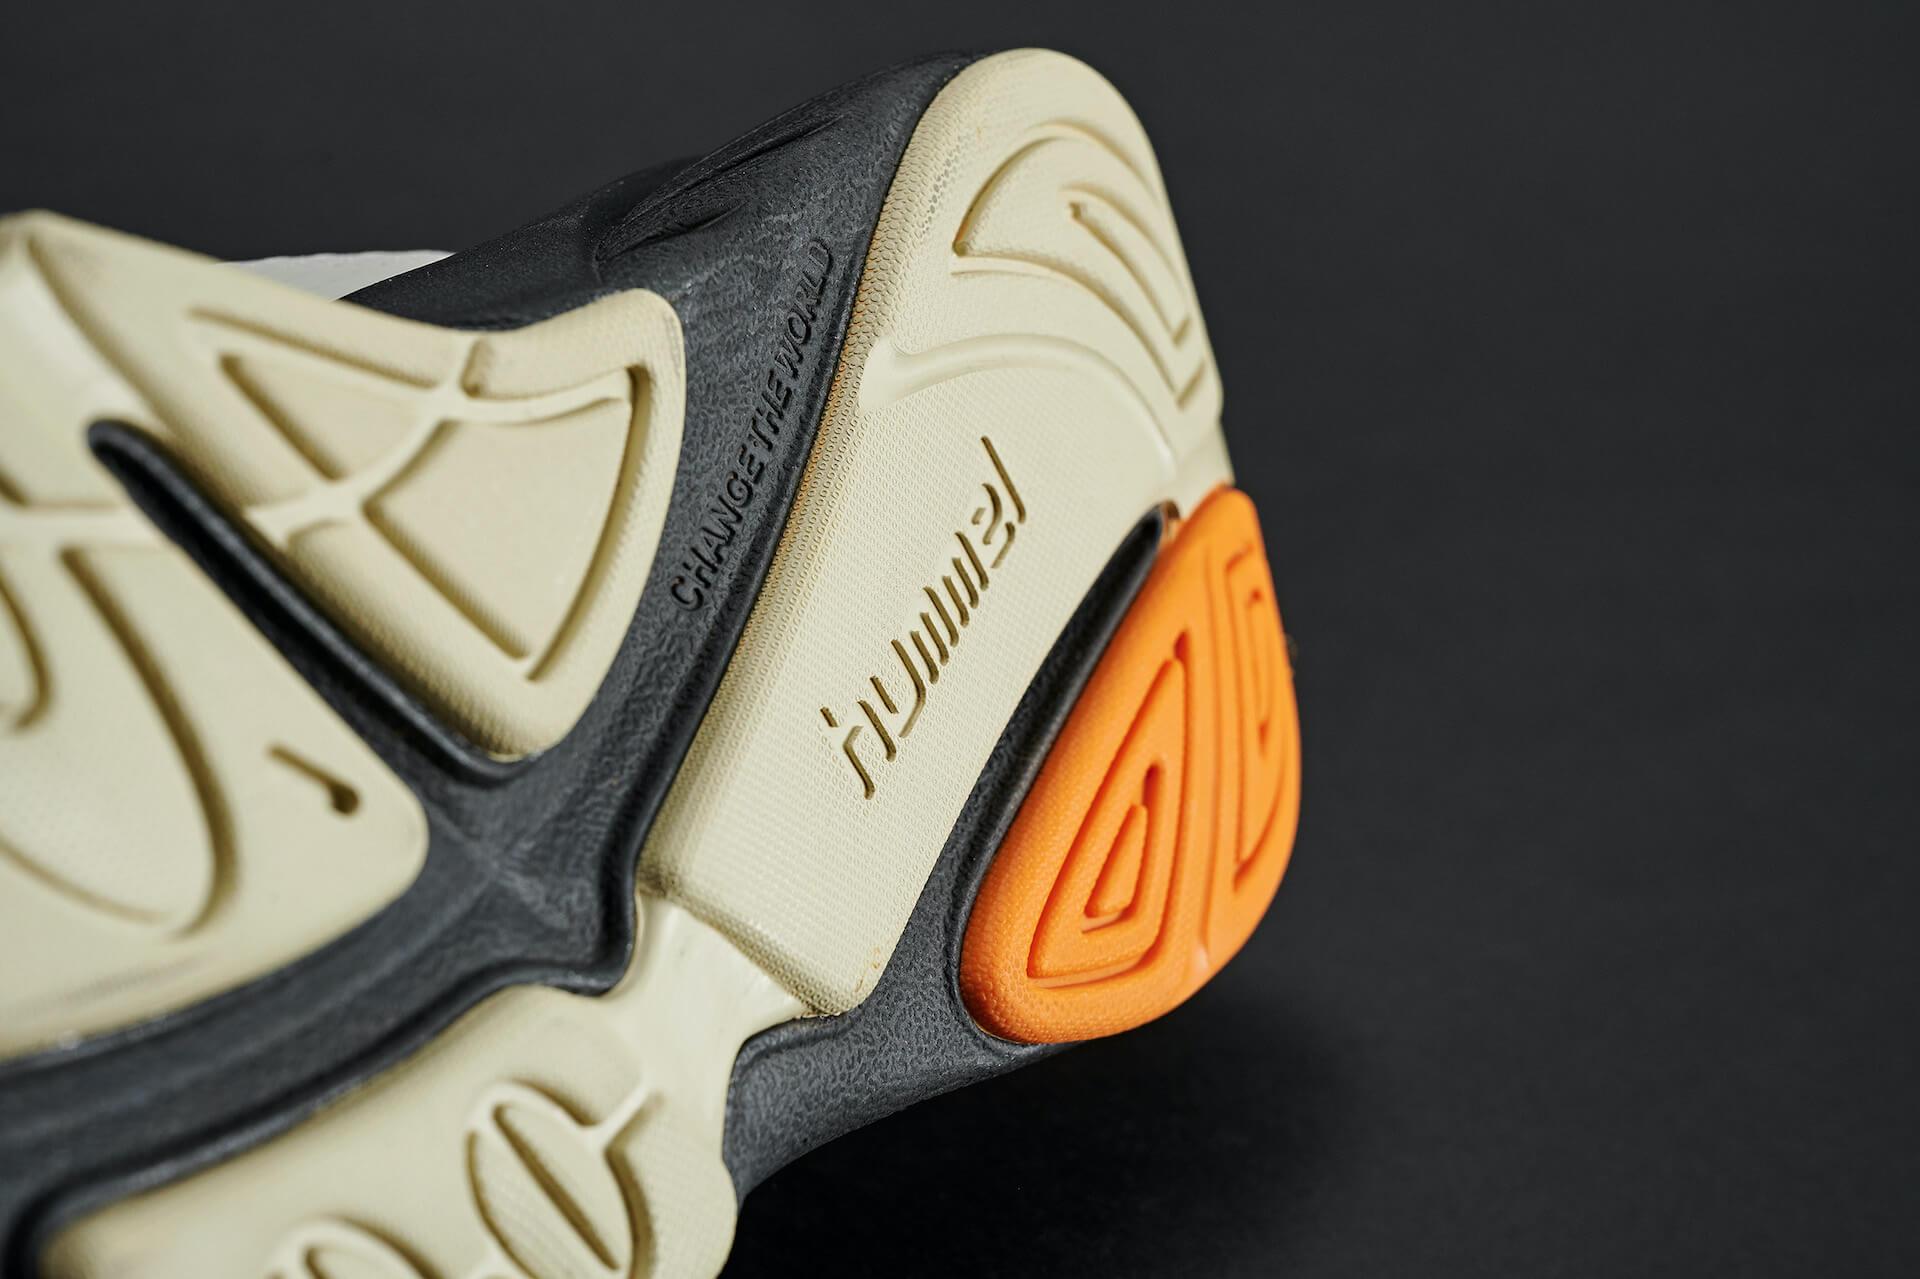 HUMMEL HIVEとASTRID ANDERSENのコラボスニーカーが東京・上野のmita sneakers限定で発売! lf200819_hummelhive_astritandersen_09